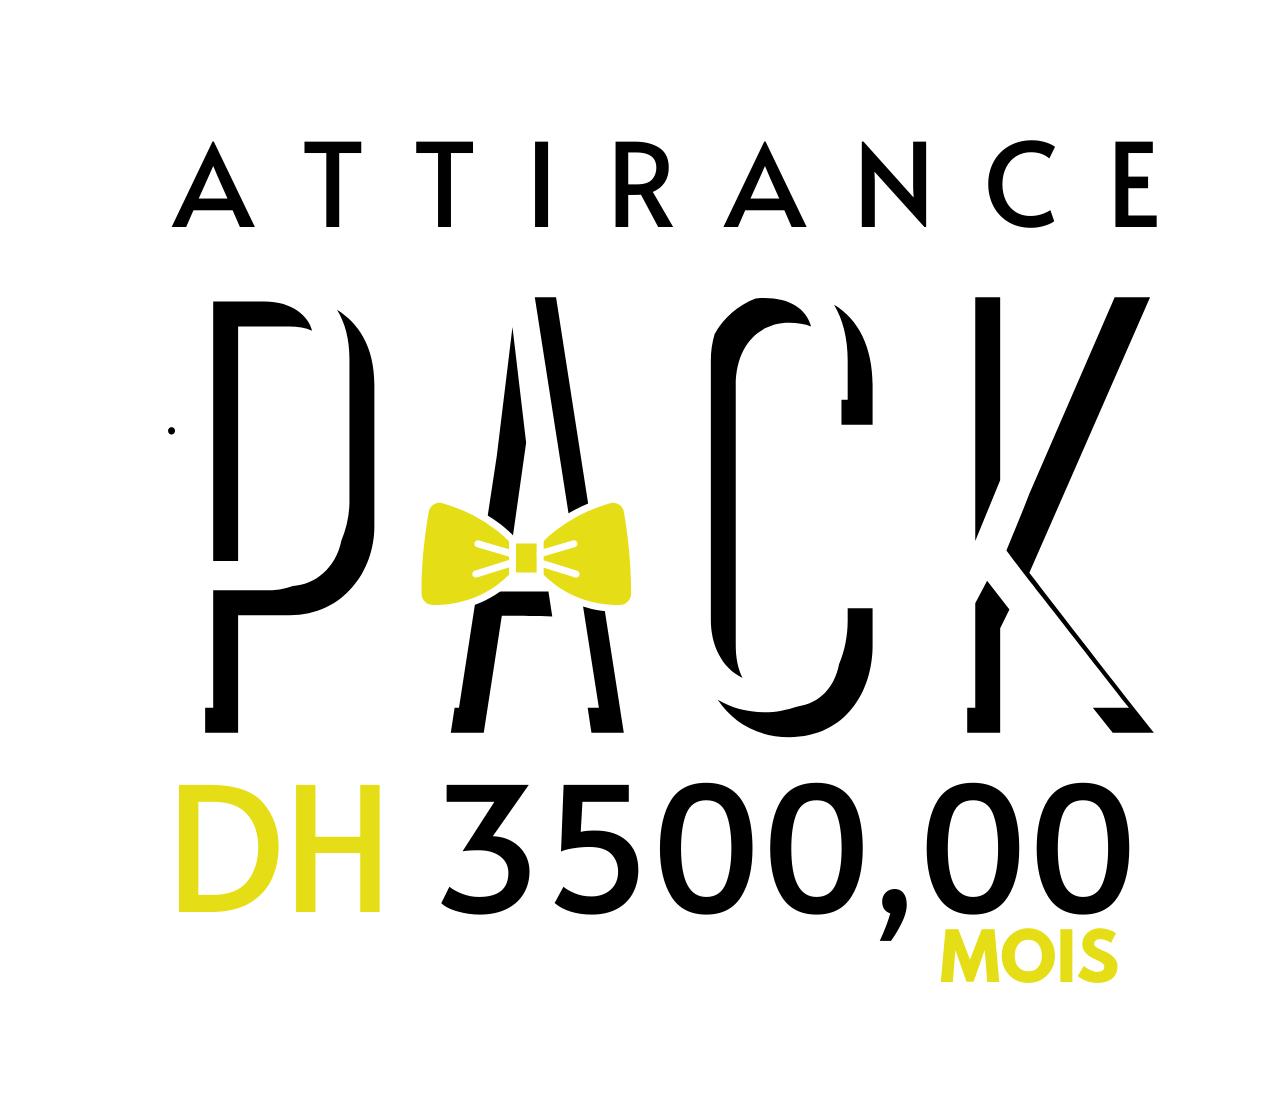 pack 1 (1)